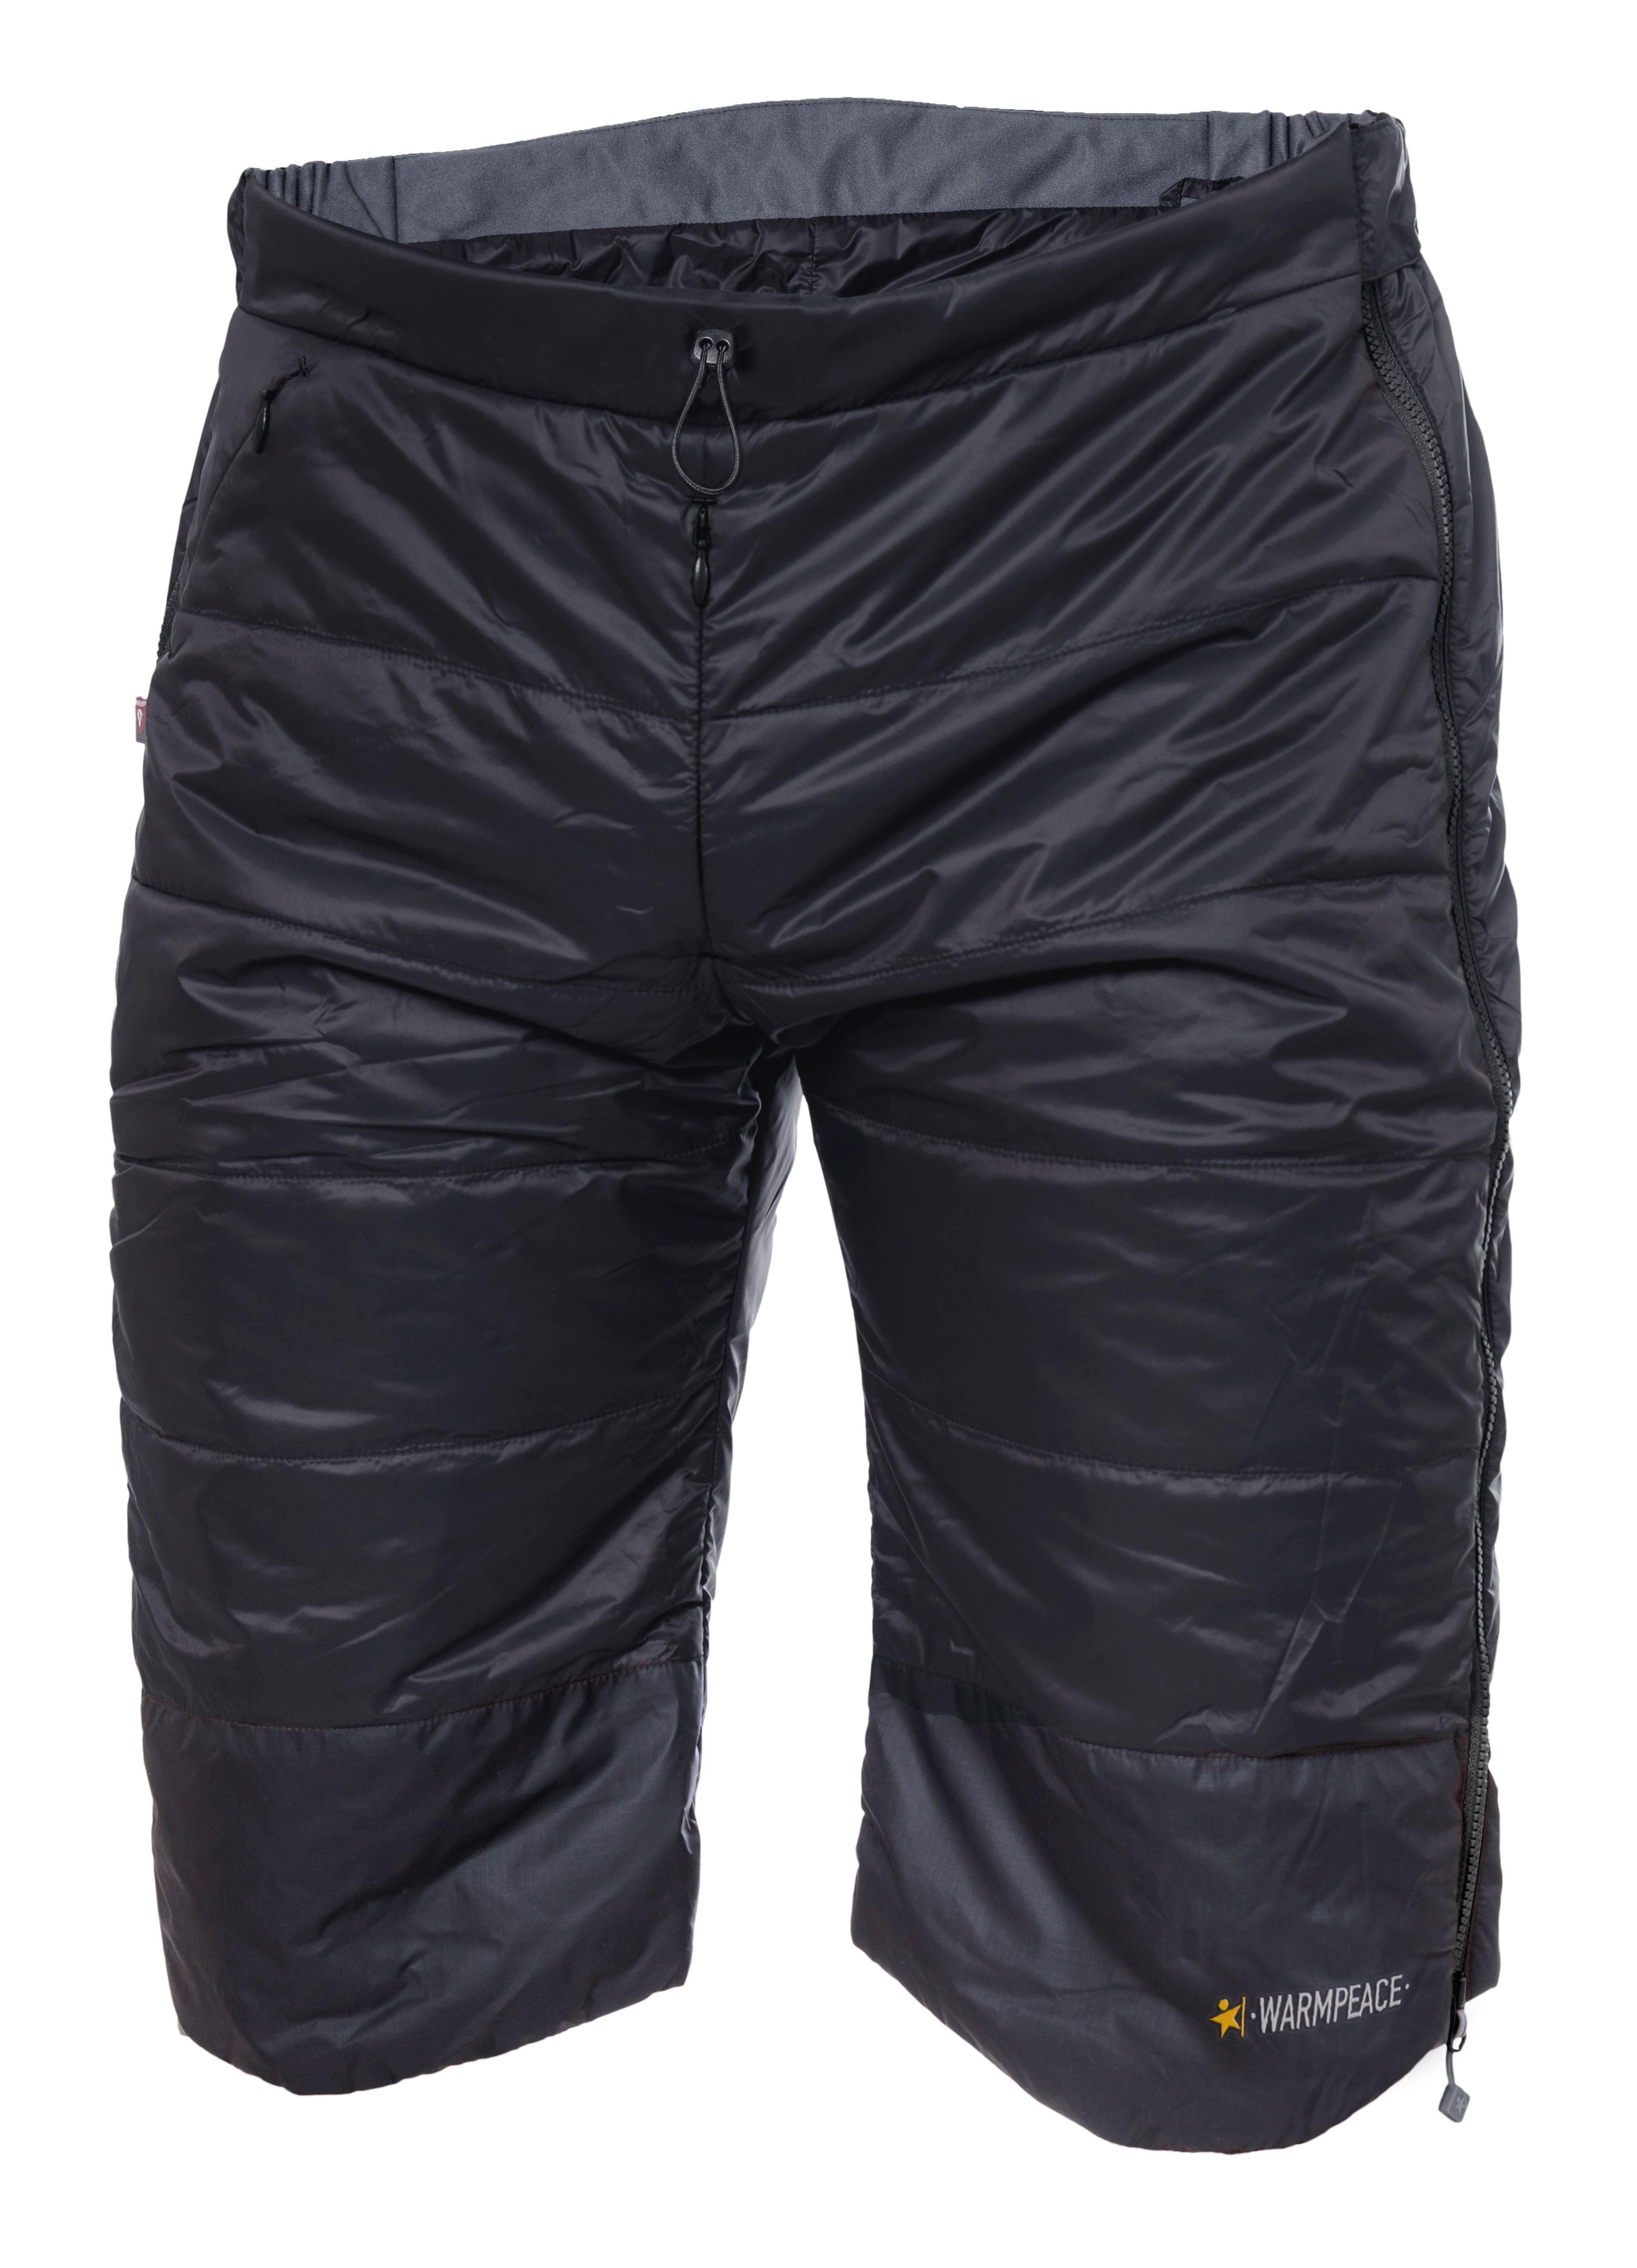 4406 Rond shorts black-dark grey